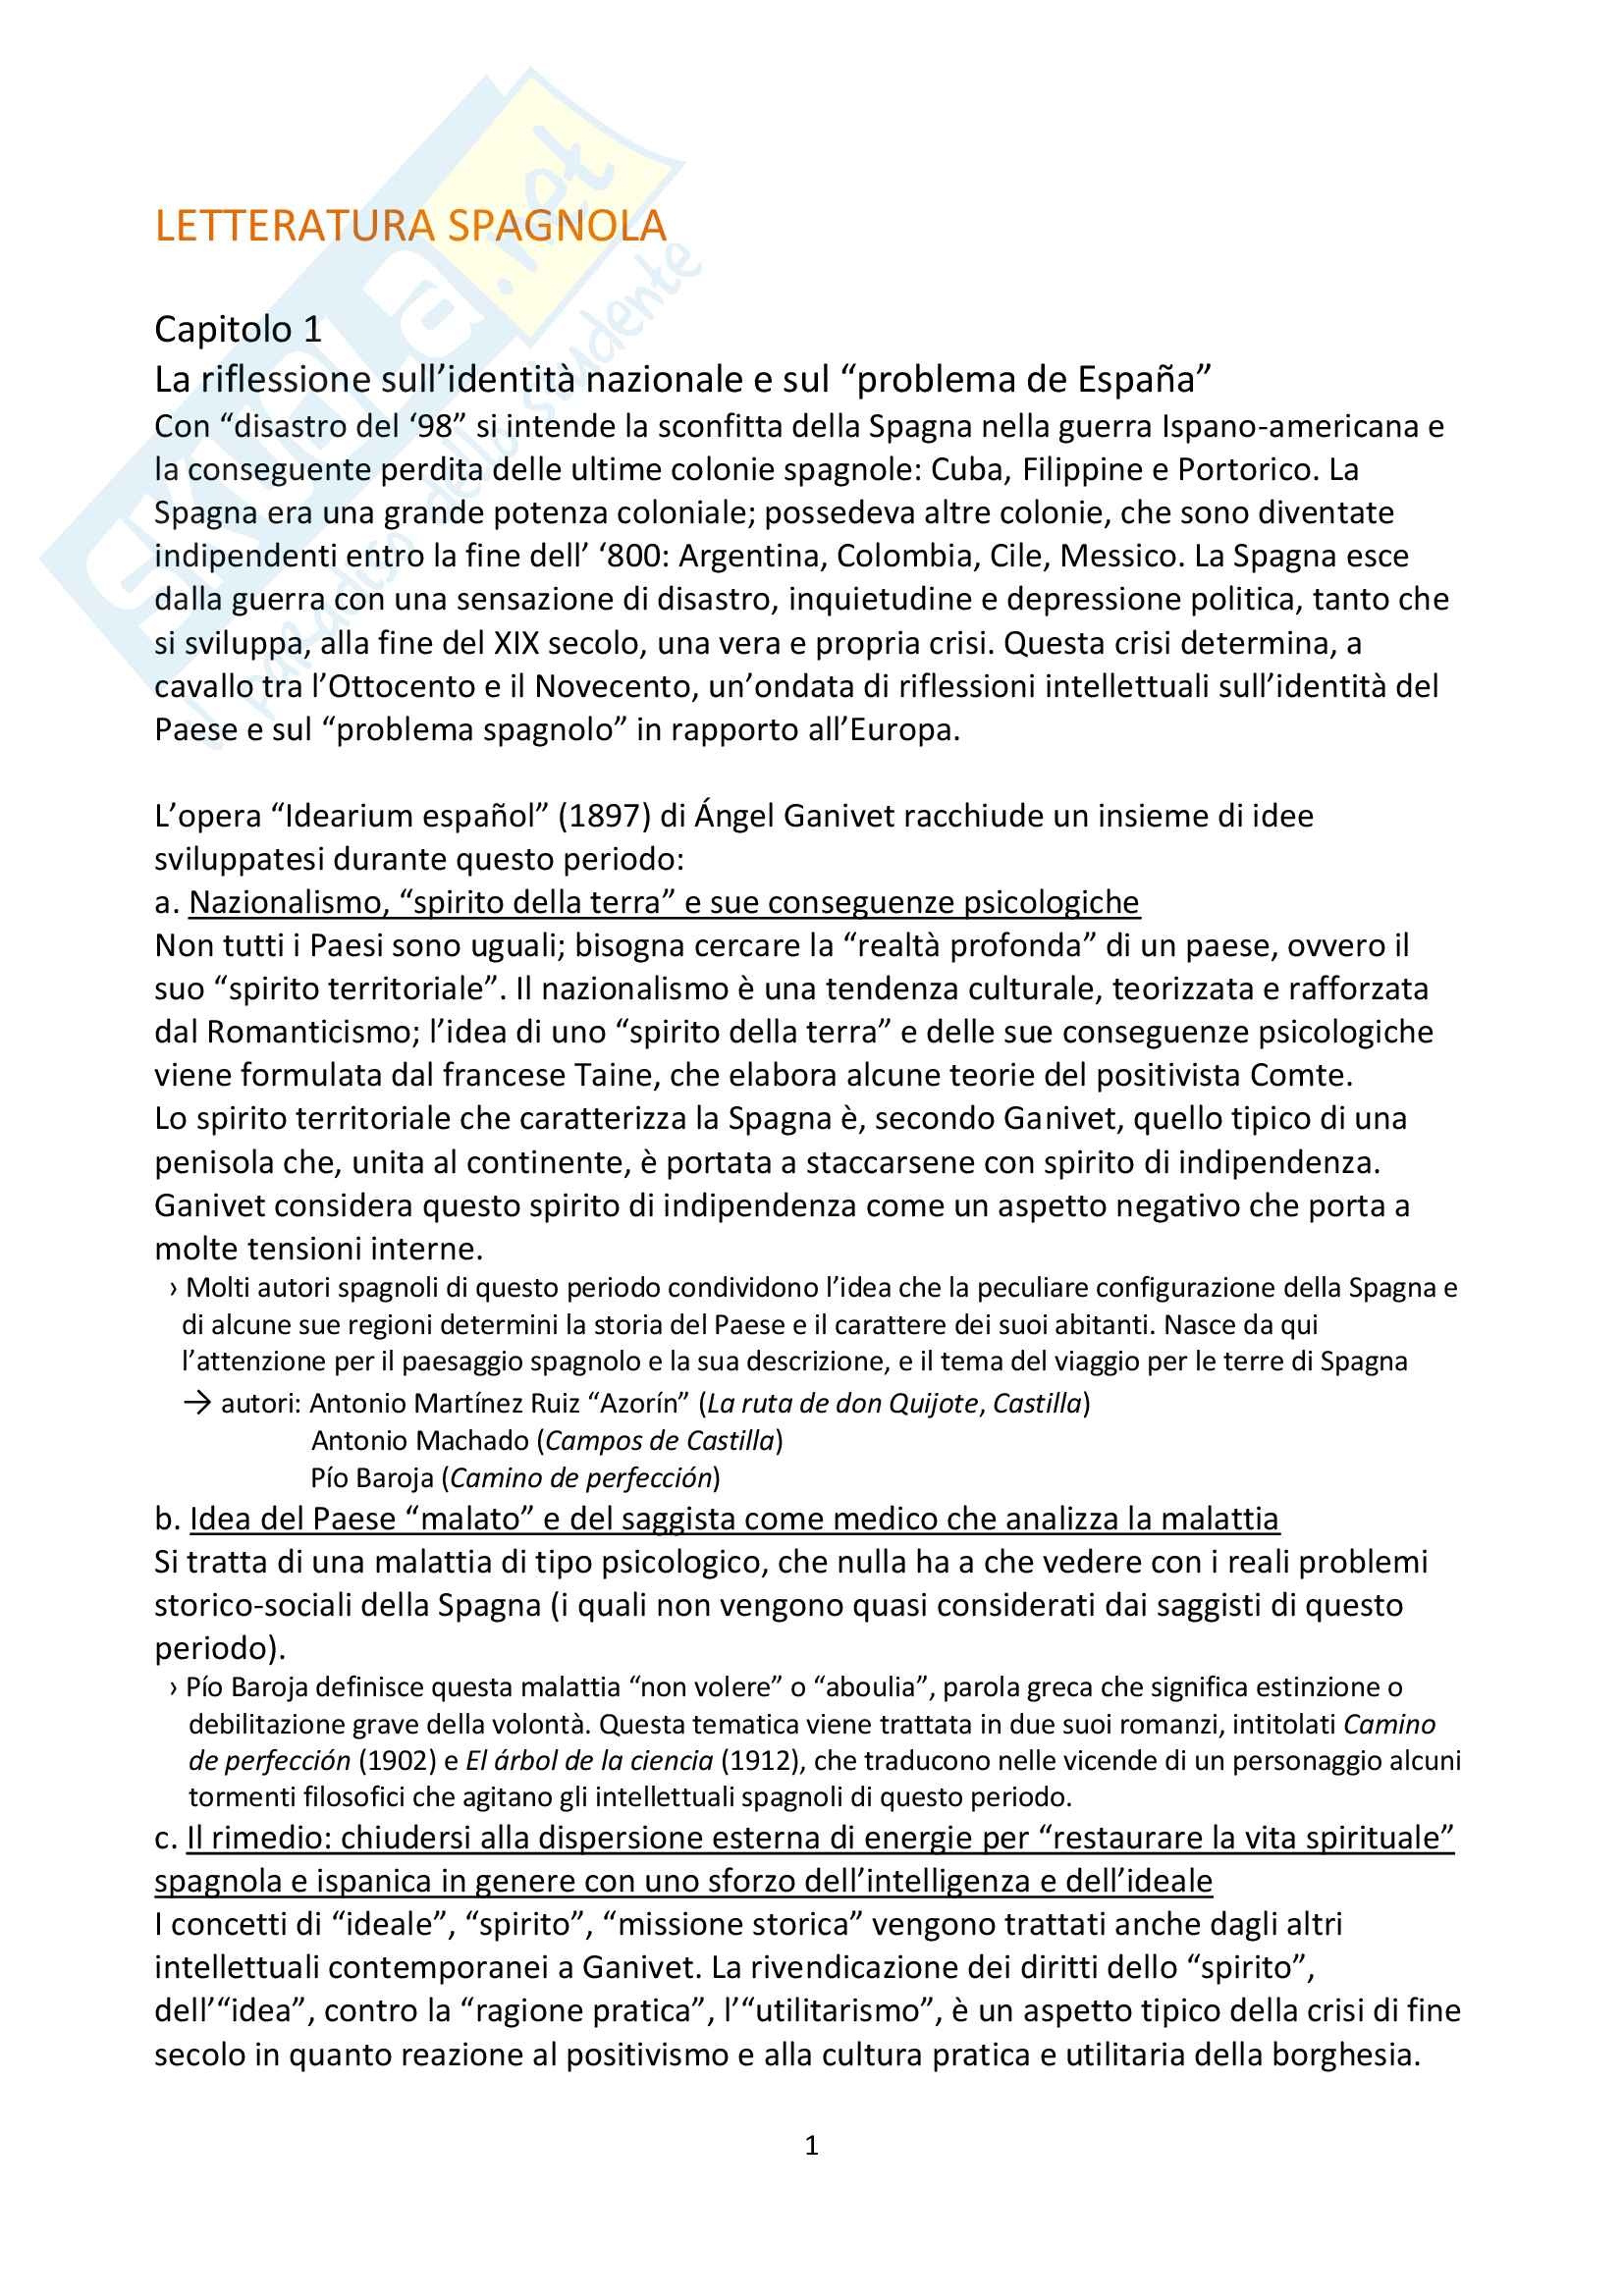 Riassunto esame Letteratura Spagnola